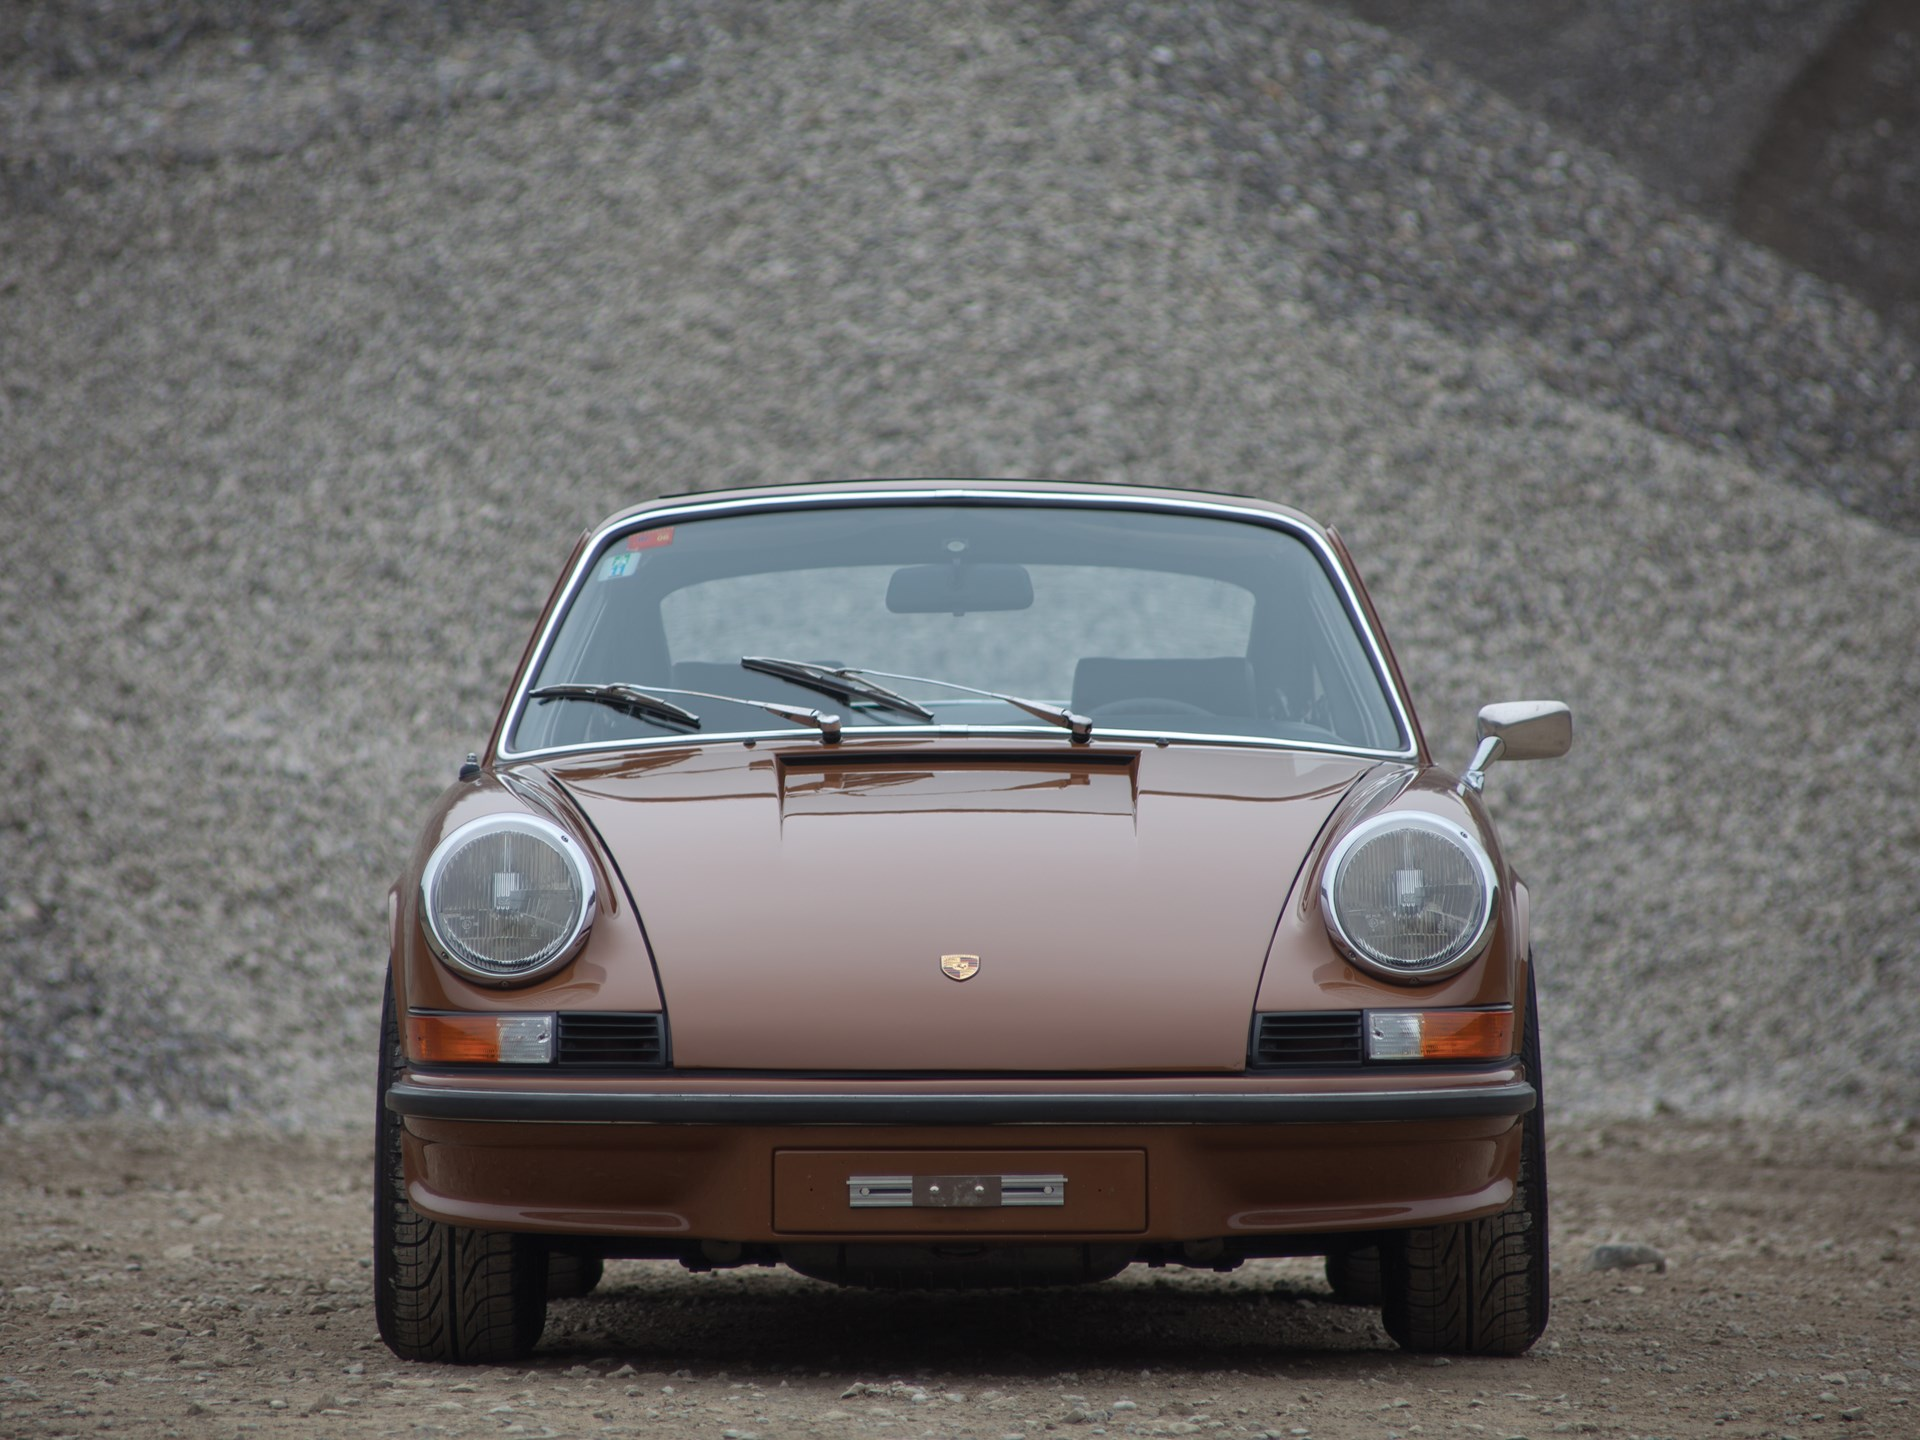 1973 Porsche 911 Carrera 2.7 RS Touring